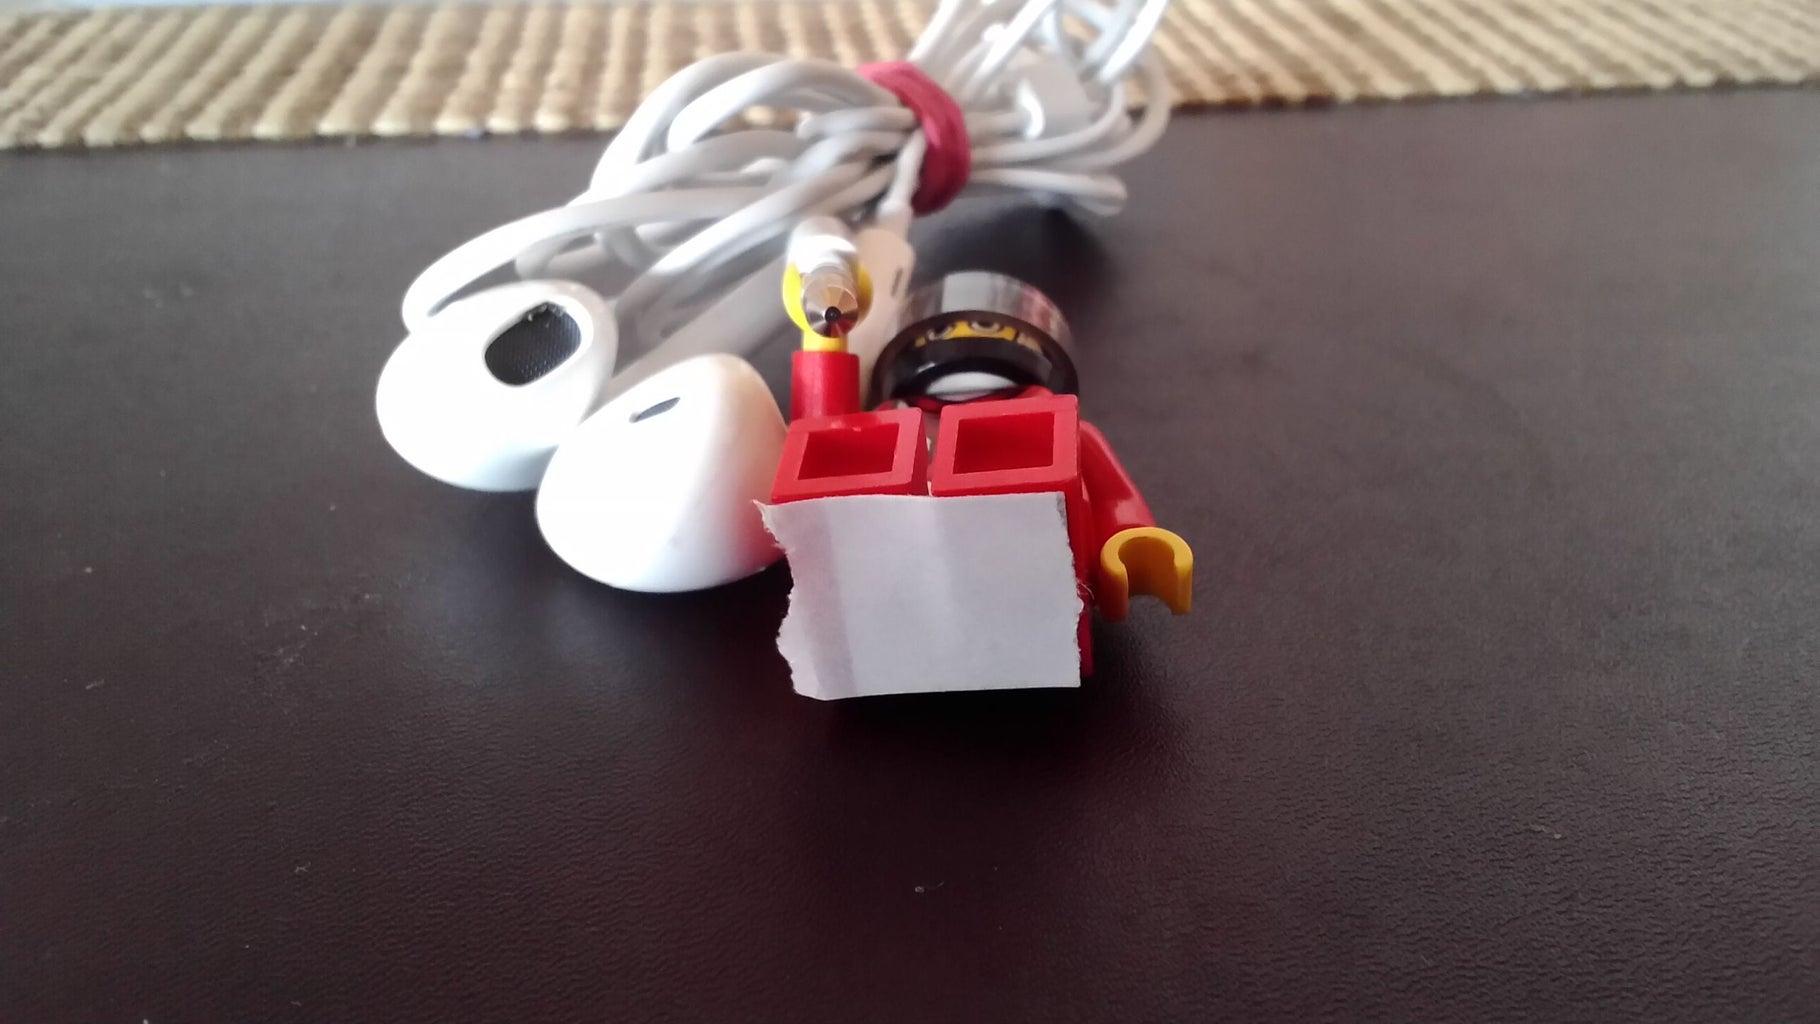 Stick the Sticker on the Lego Man